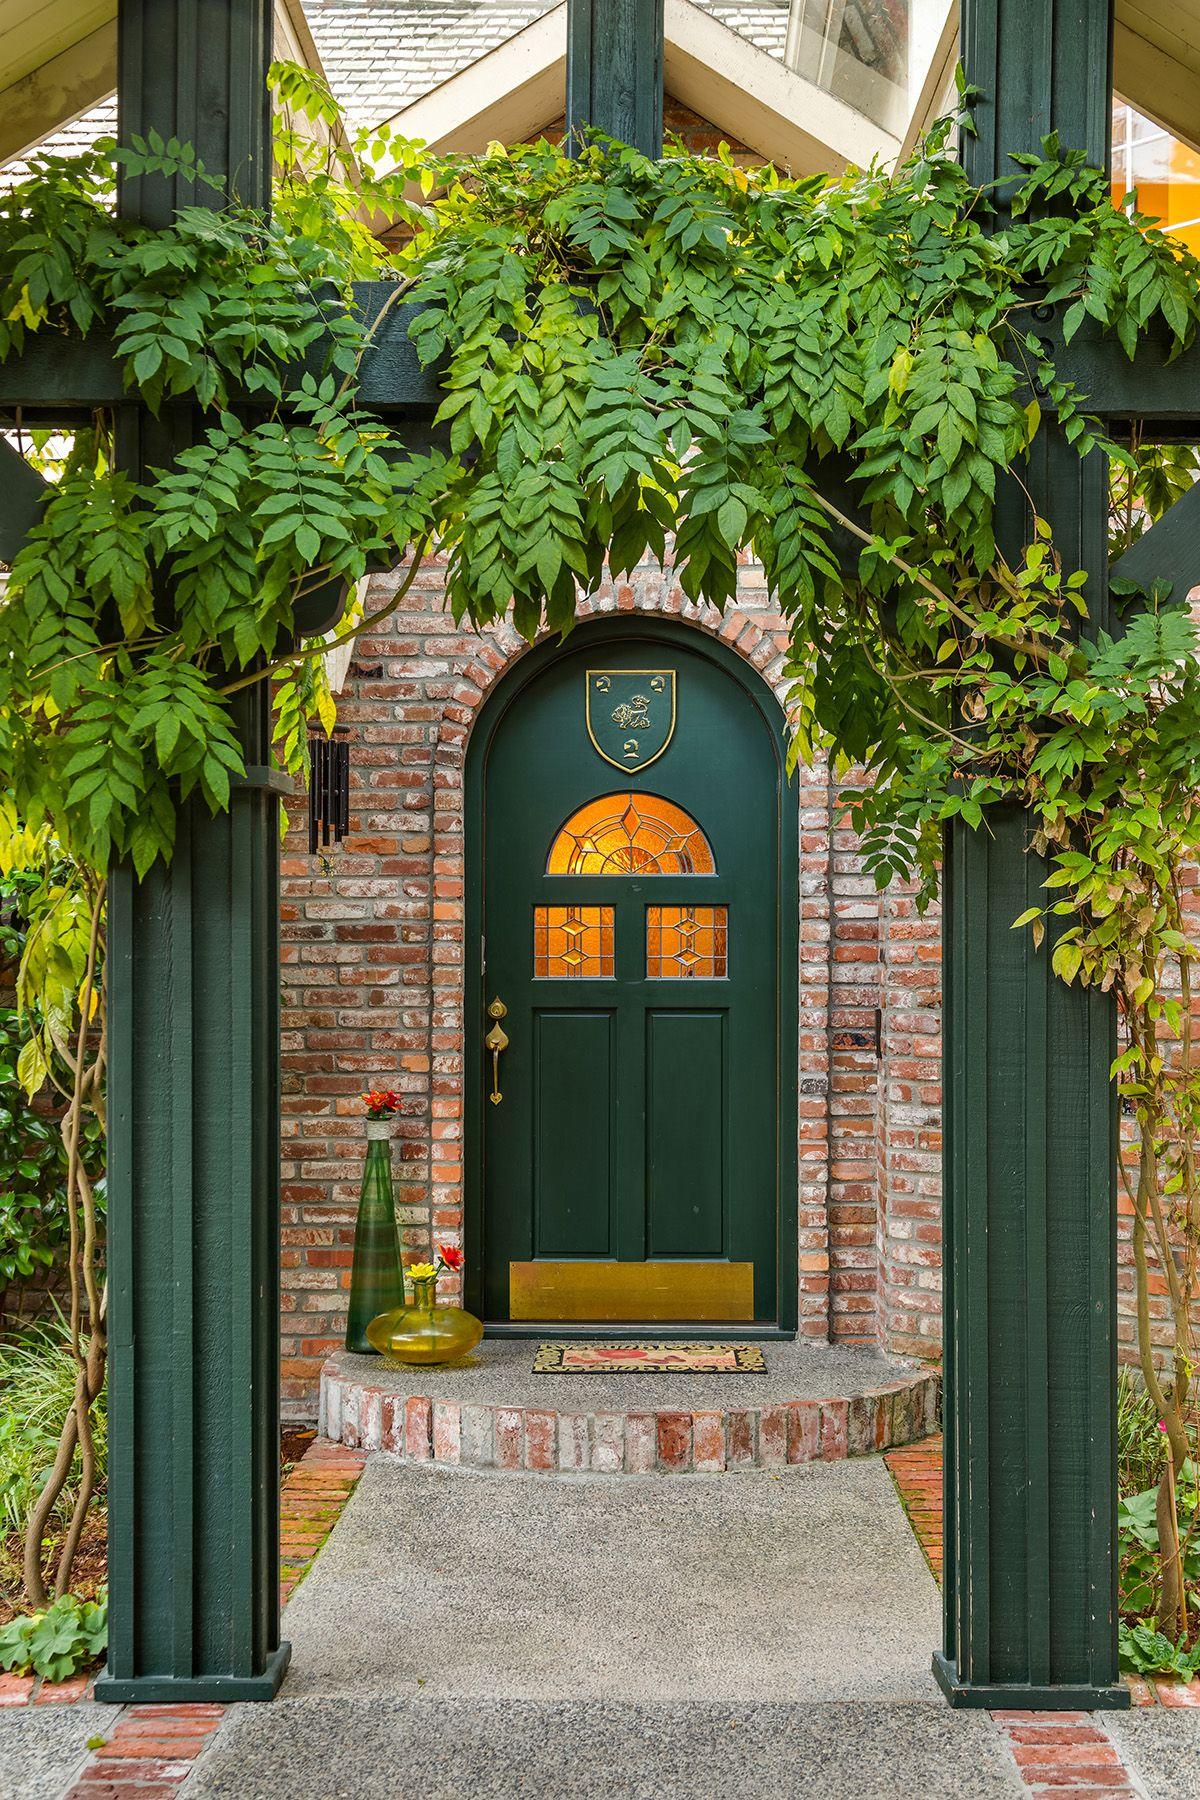 Single Family Homes for Sale at Legendary Art of Living 3325 126th Ave NE, Bellevue, Washington 98005 United States